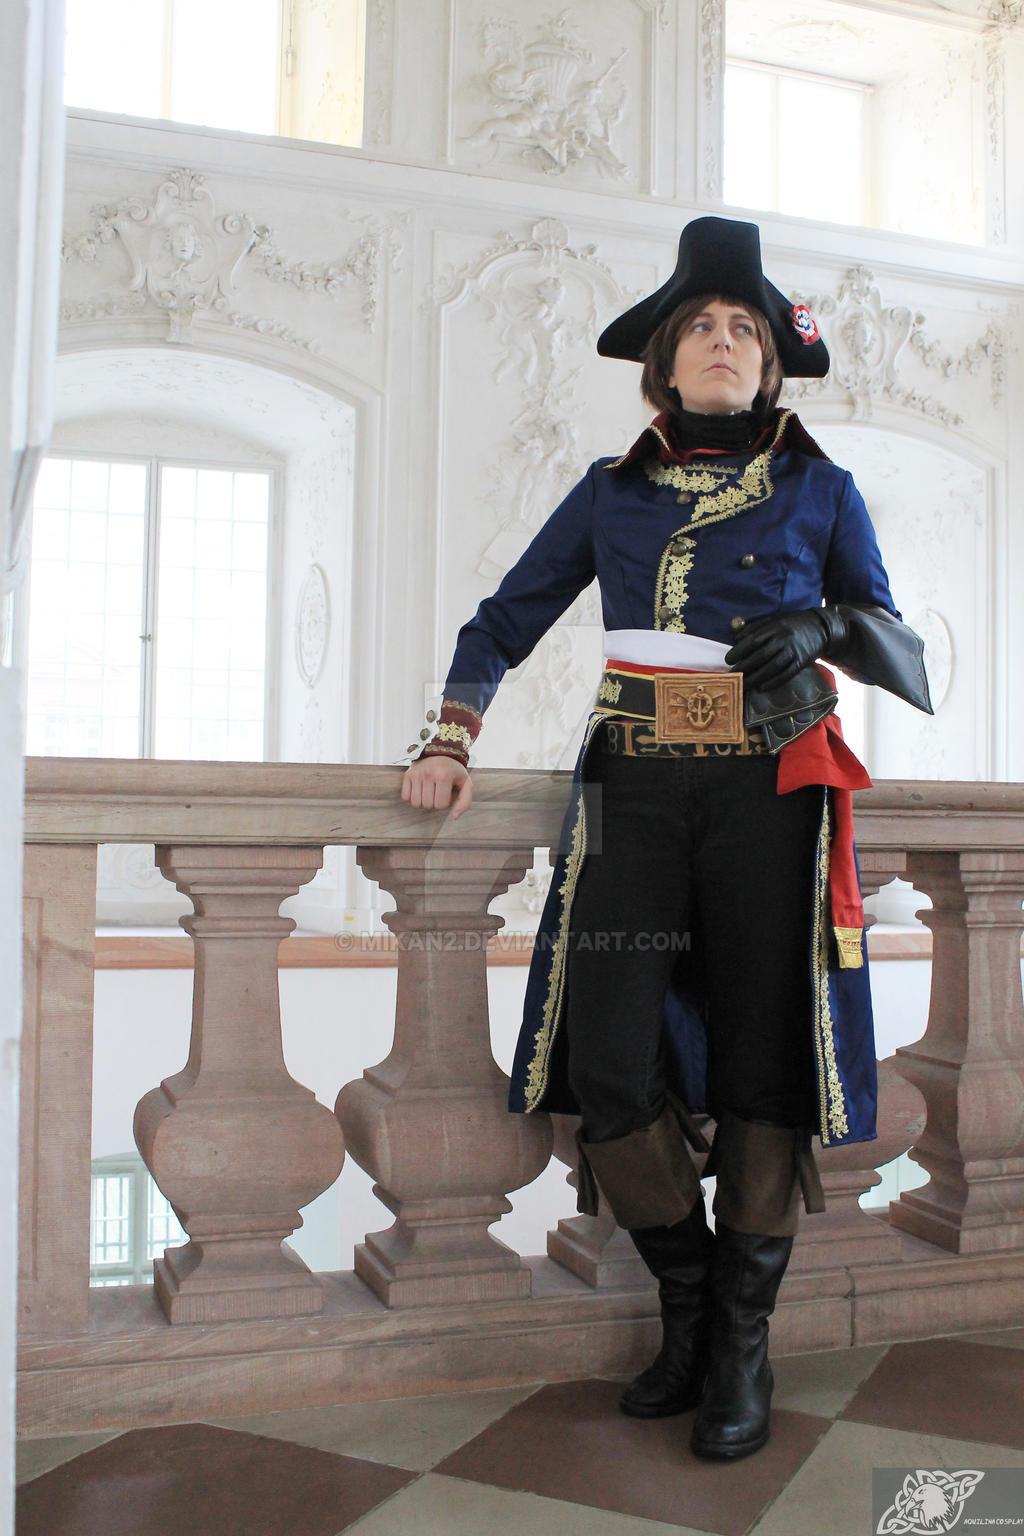 Napoleon Bonaparte Assassins Creed Unity By Mikan2 On Deviantart